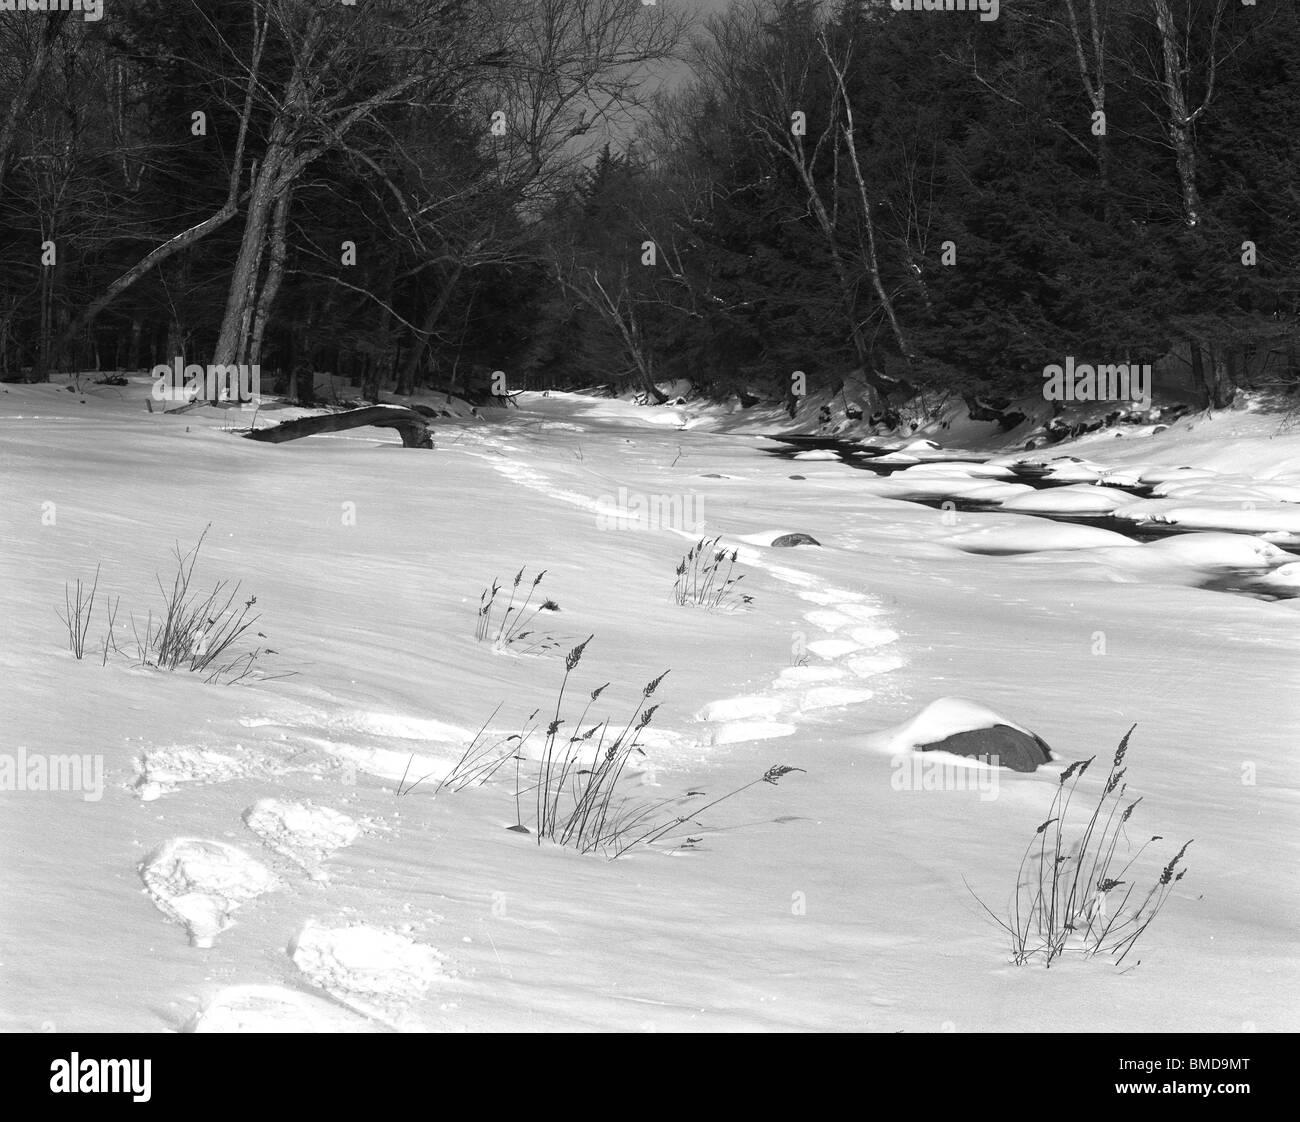 Snow Shoe Tracks along west Branch of Neversink River, NY - Stock Image